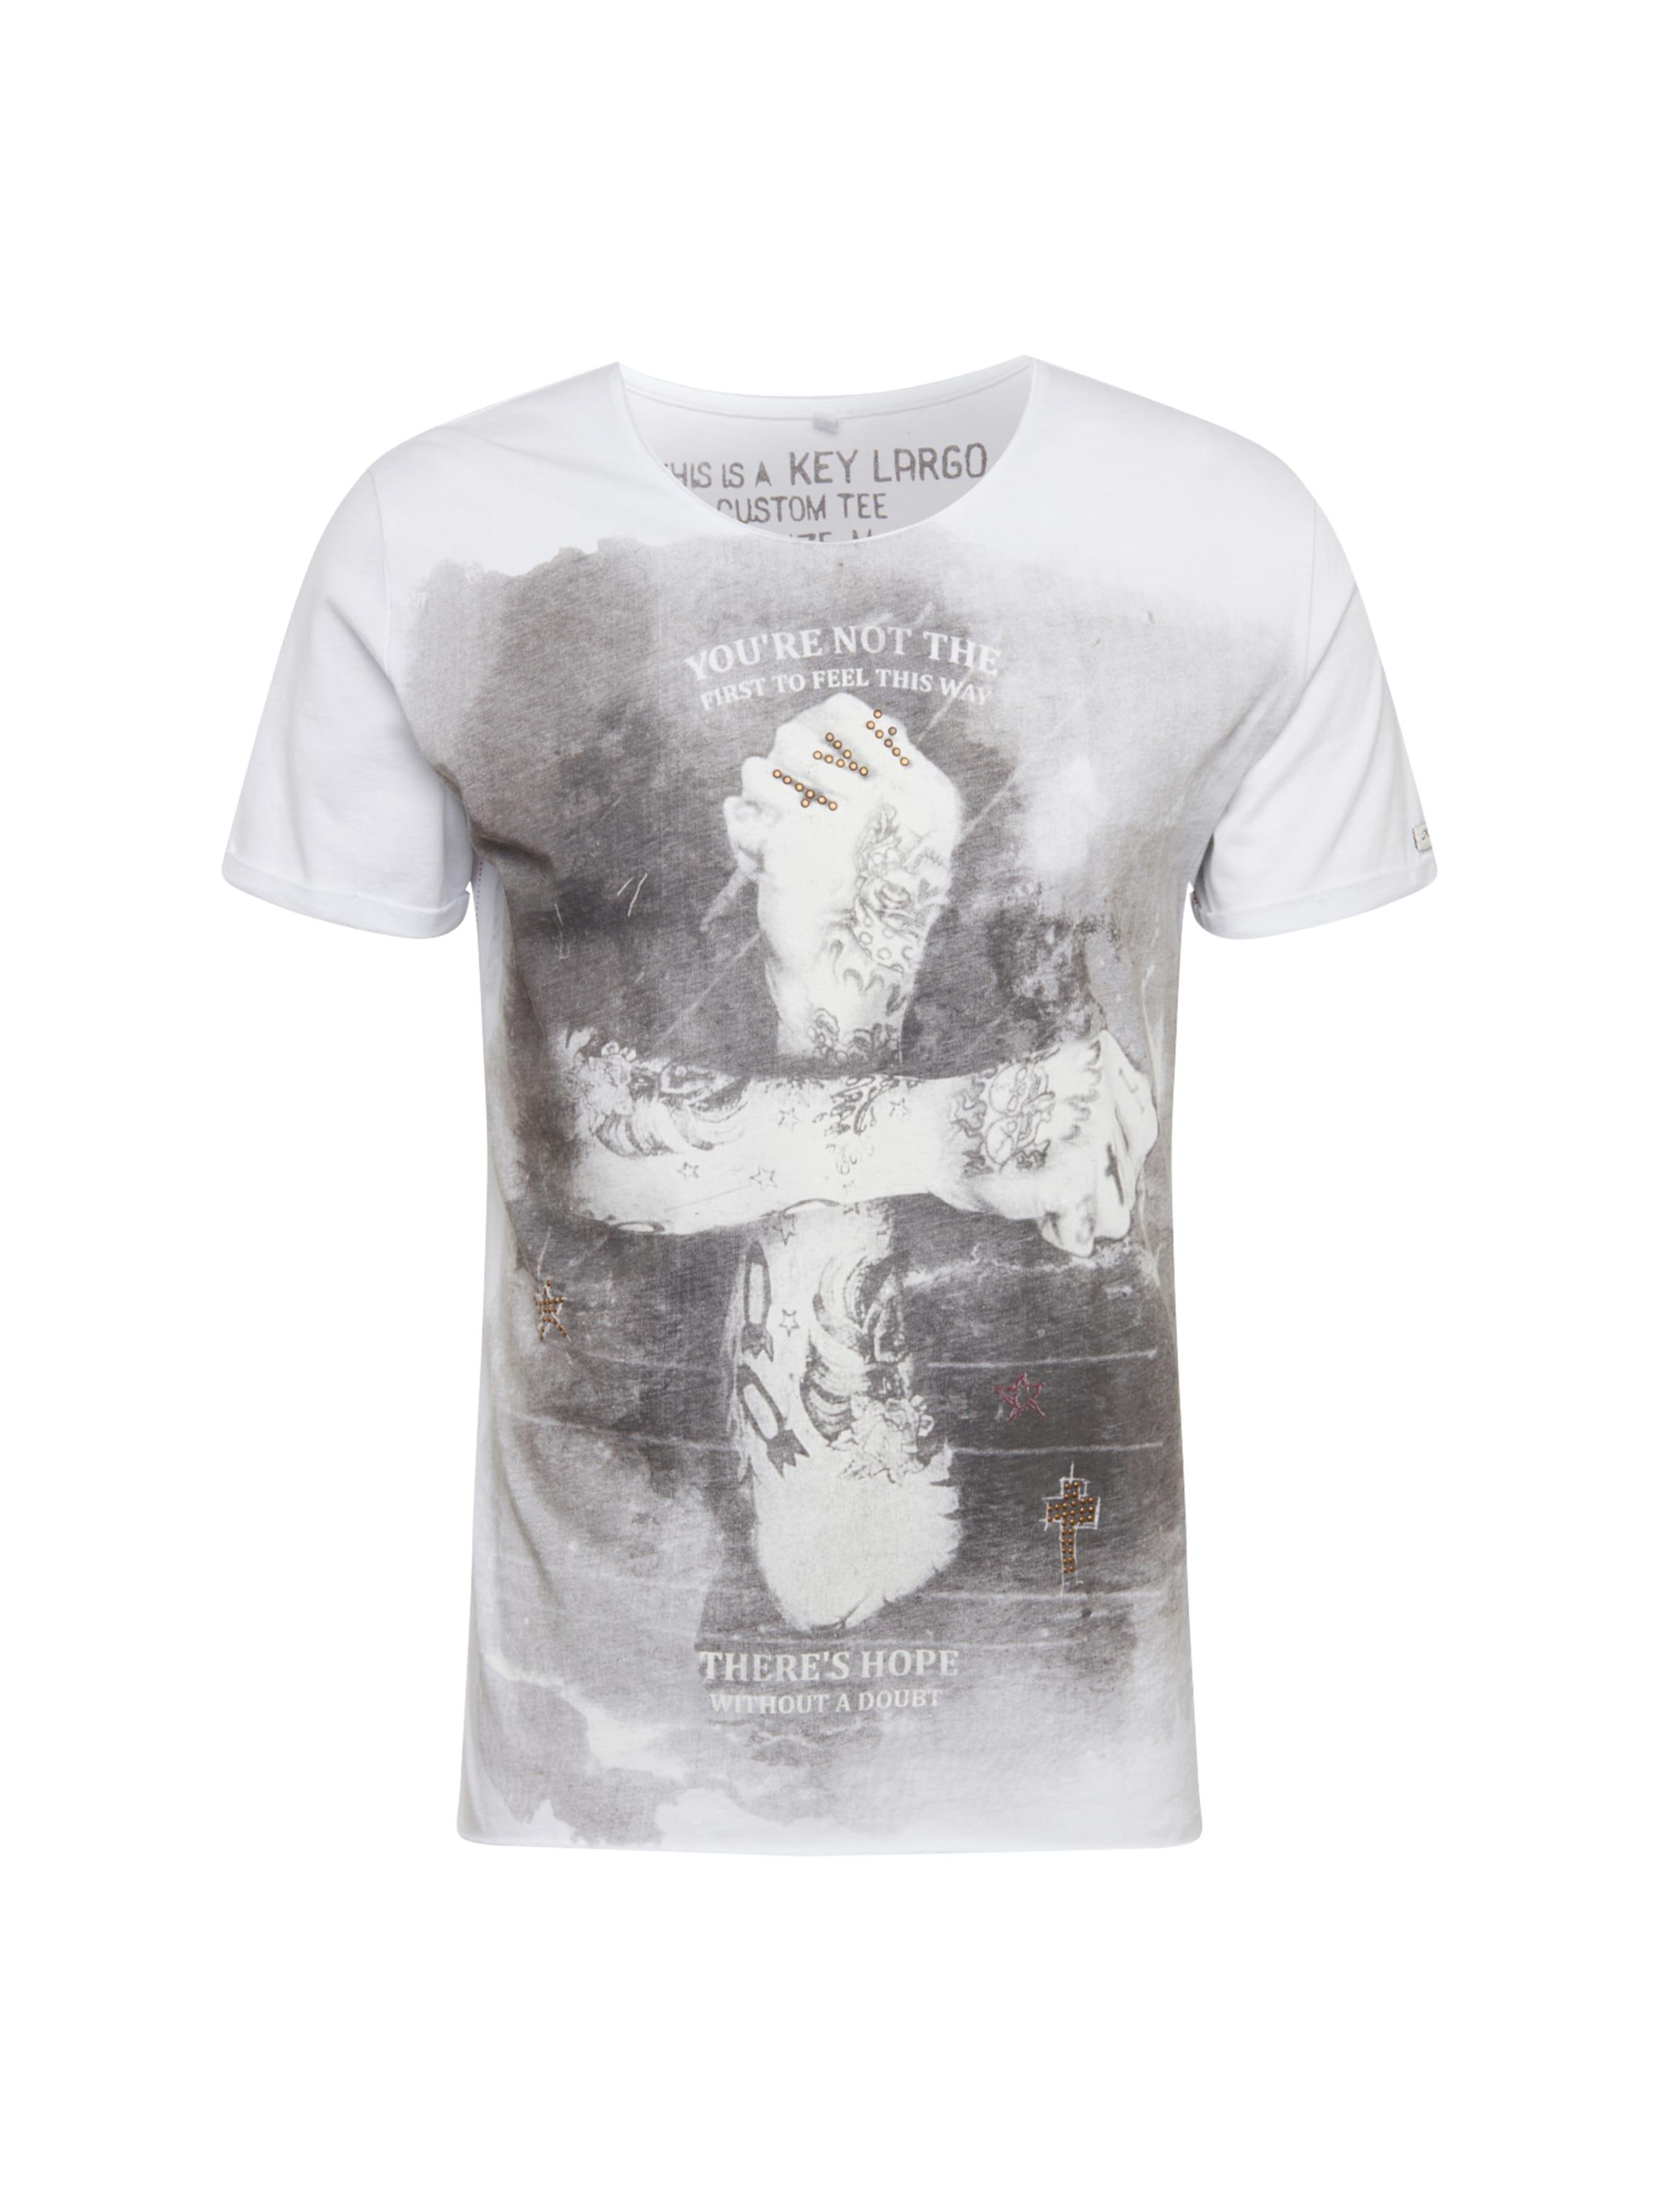 Round' T Key Largo shirt En Doubt 'mt GrisBlanc E9YeIHWbD2